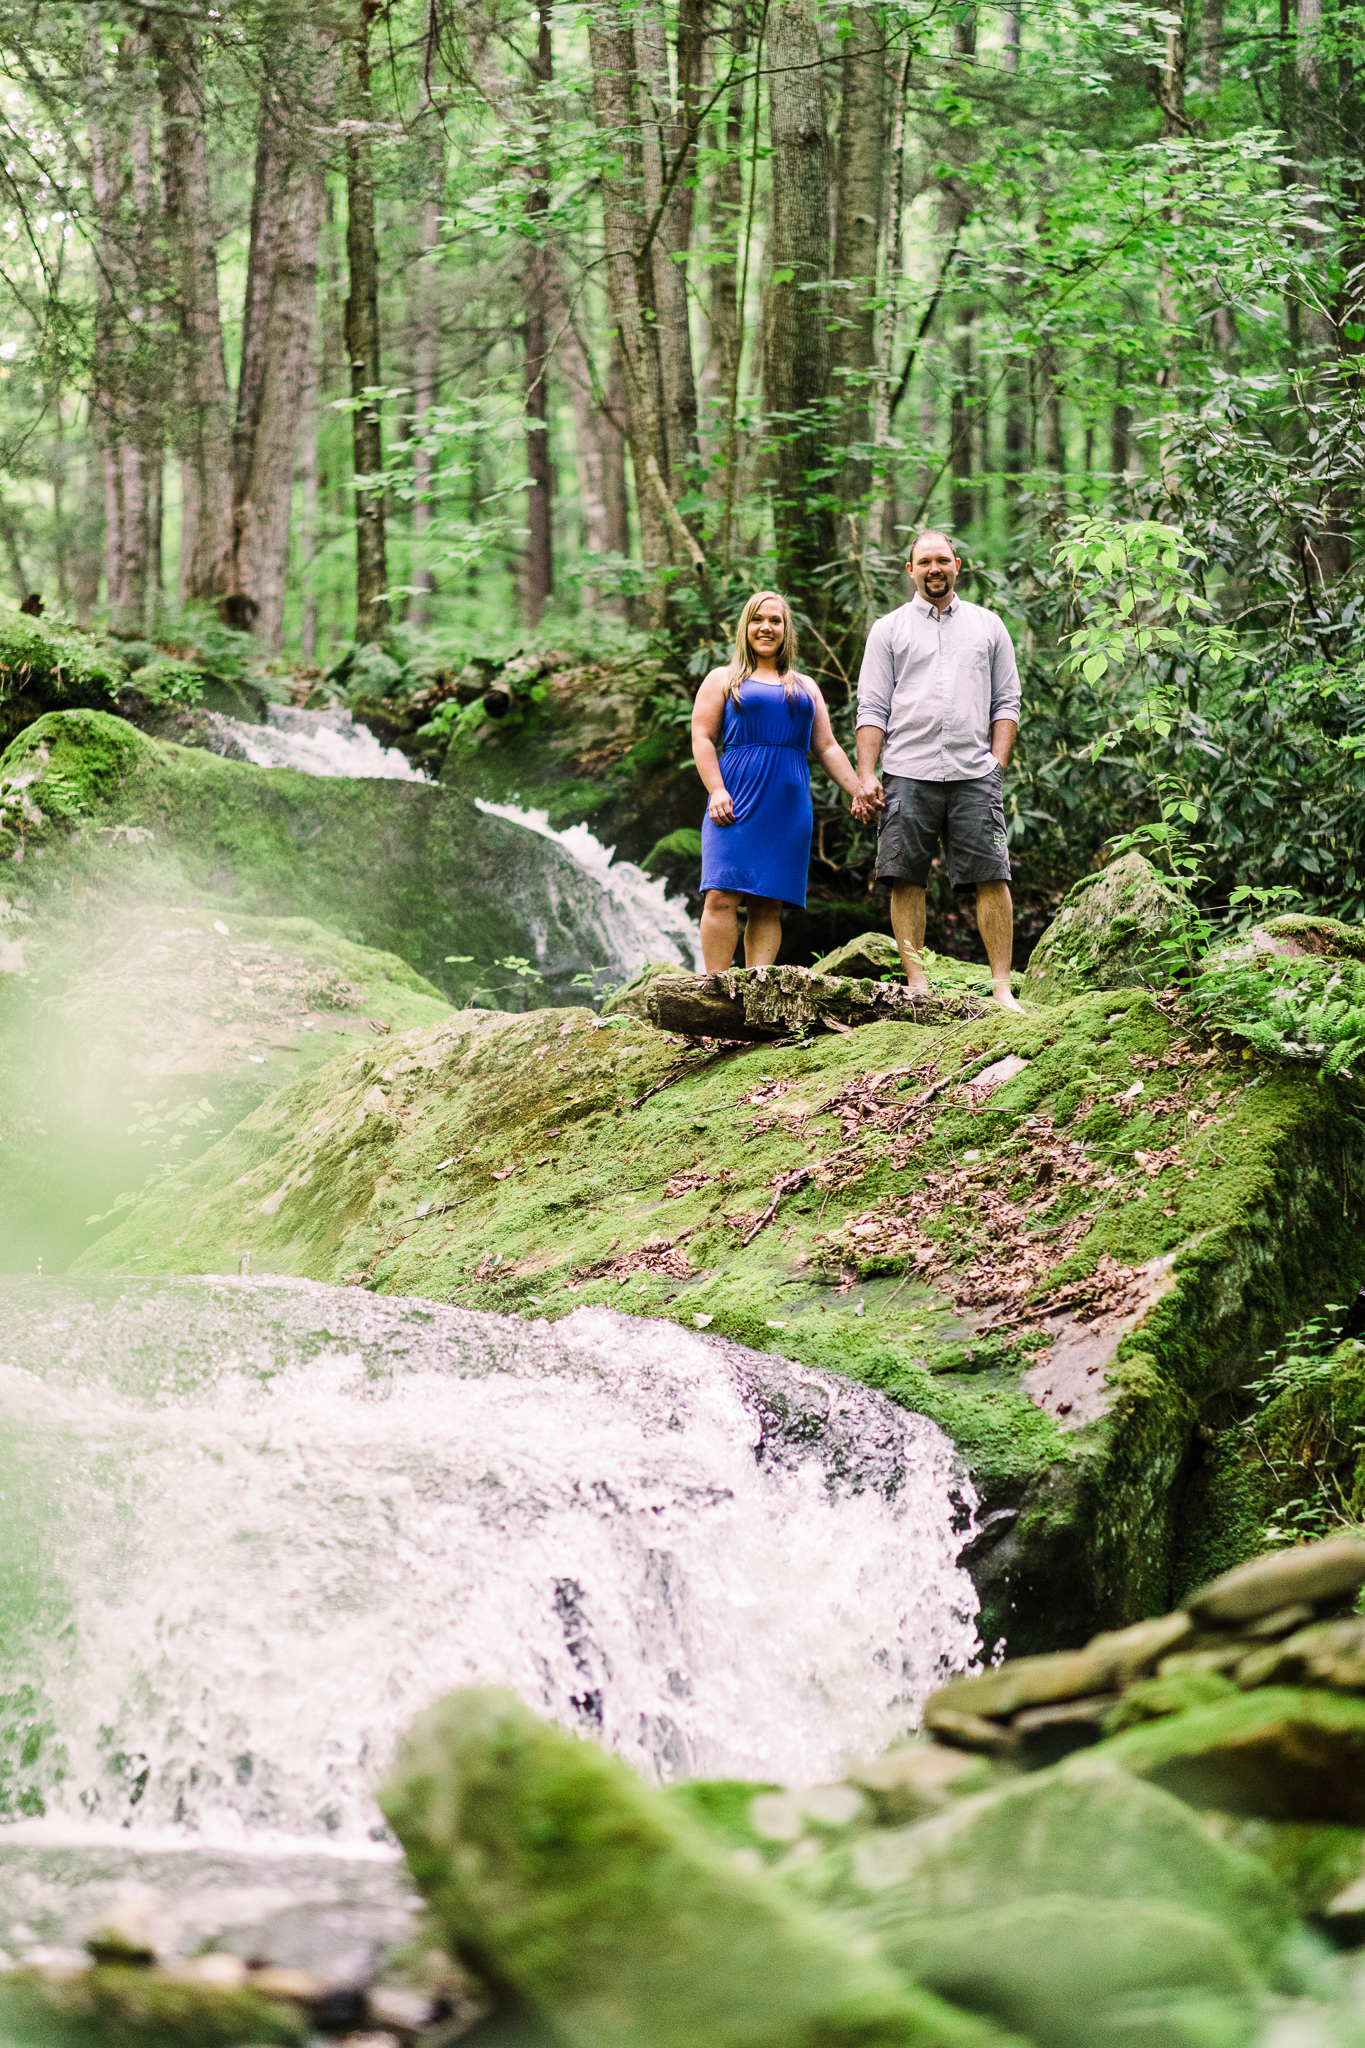 Kettle-creek-state-park-engagement-9630.jpg